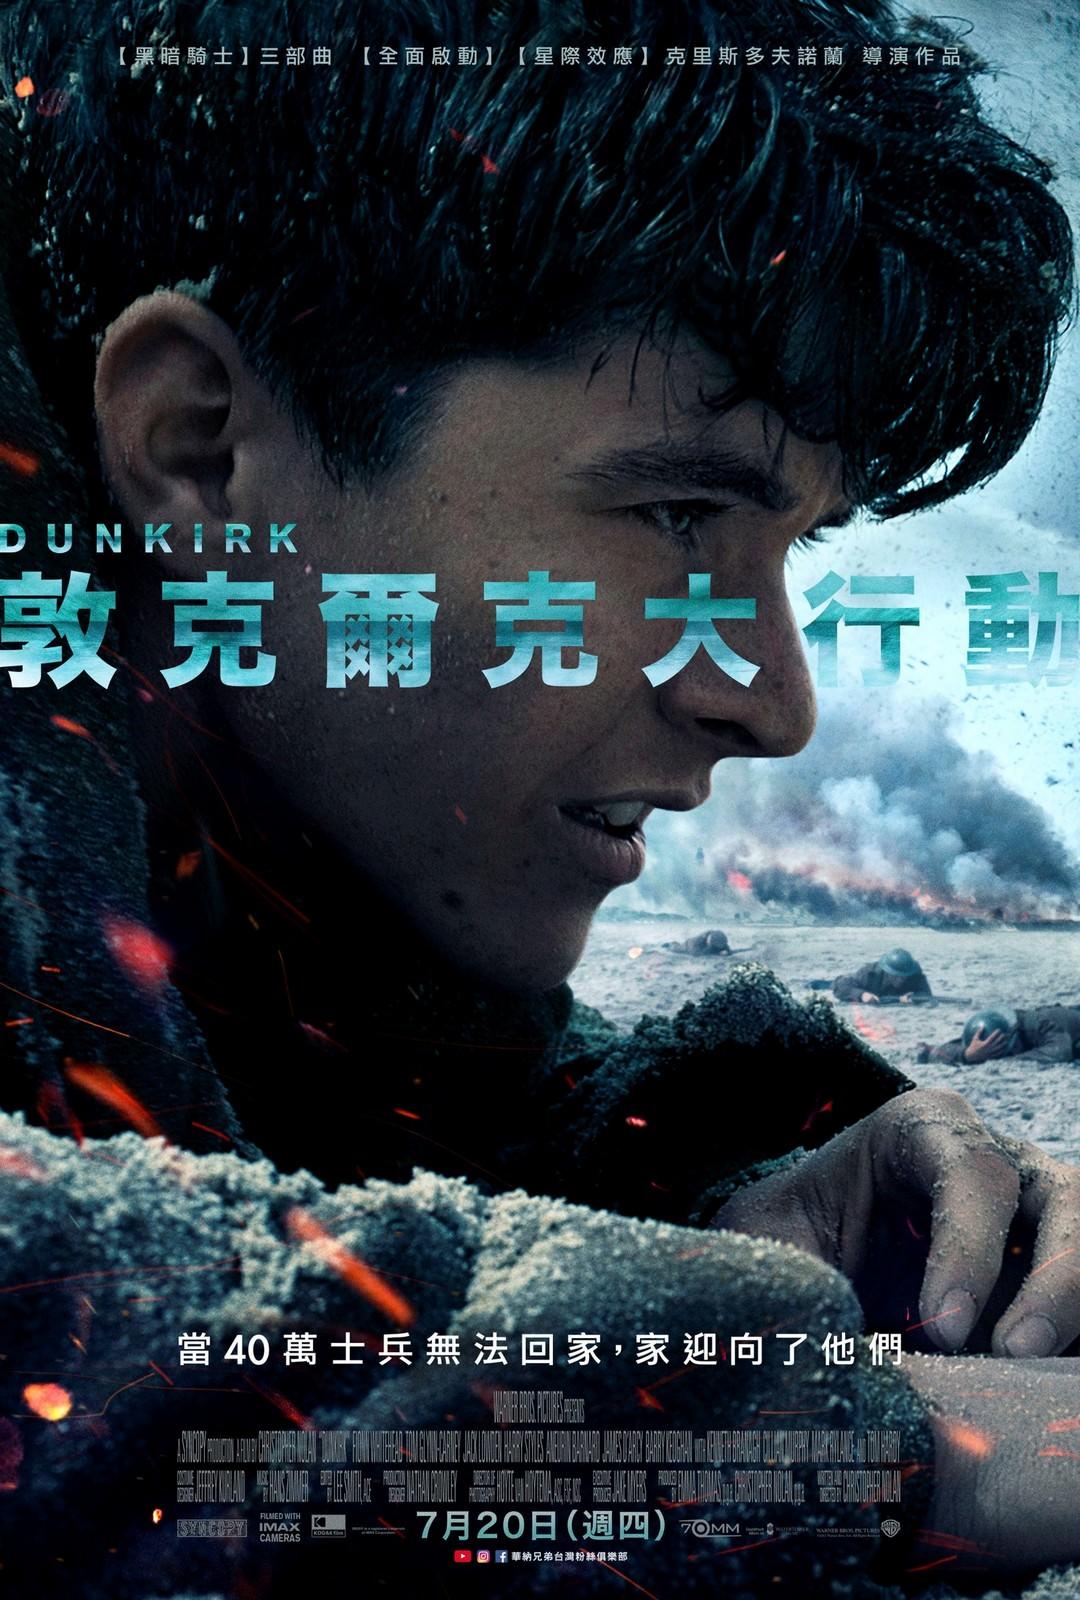 Movie, Dunkirk(美國, 2017年) / 敦克爾克大行動(台灣) / 敦刻尔克(中國) / 鄧寇克大行動(香港), 電影海報, 台灣